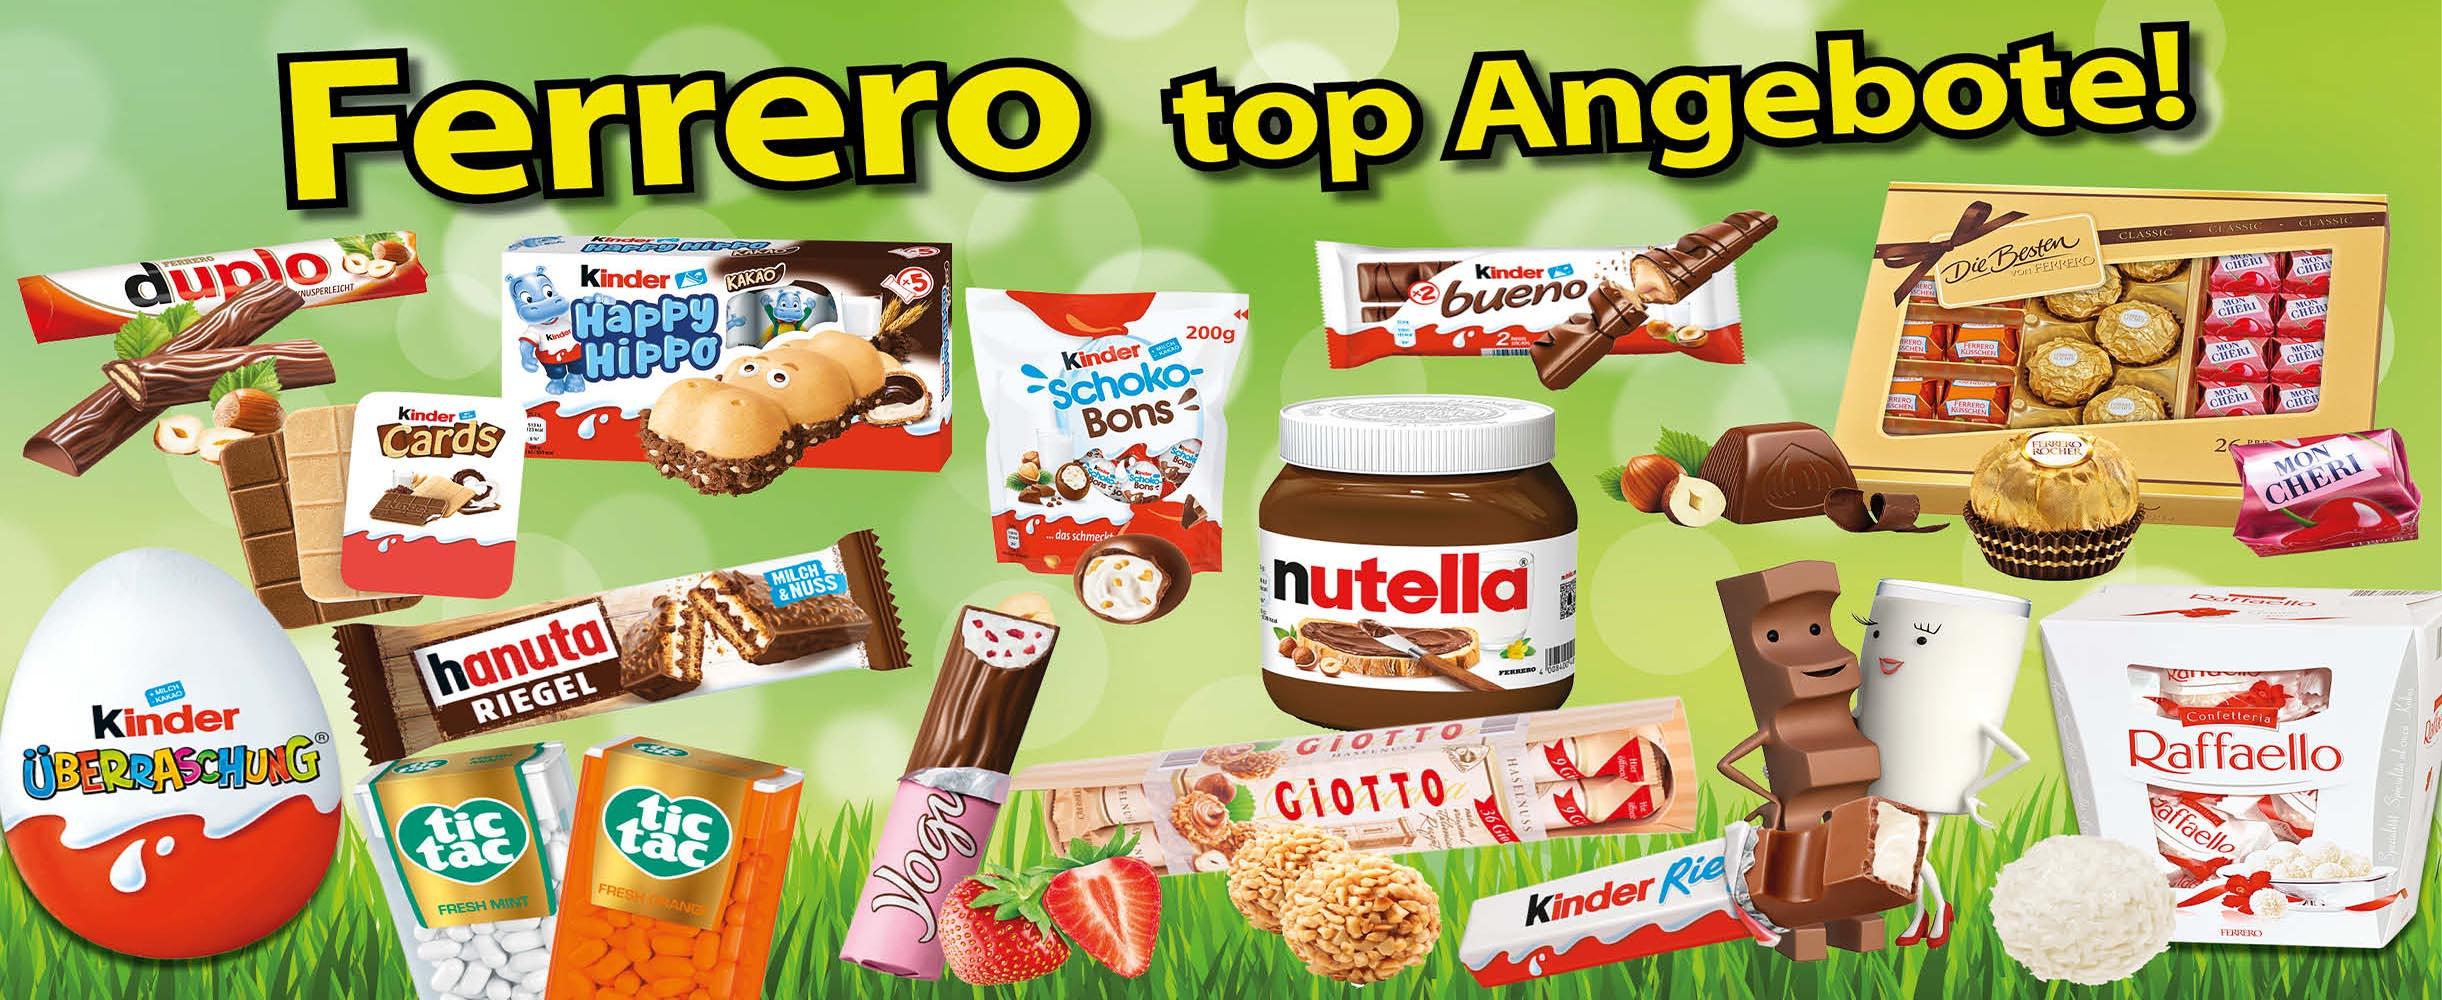 Ferrero top Angebote